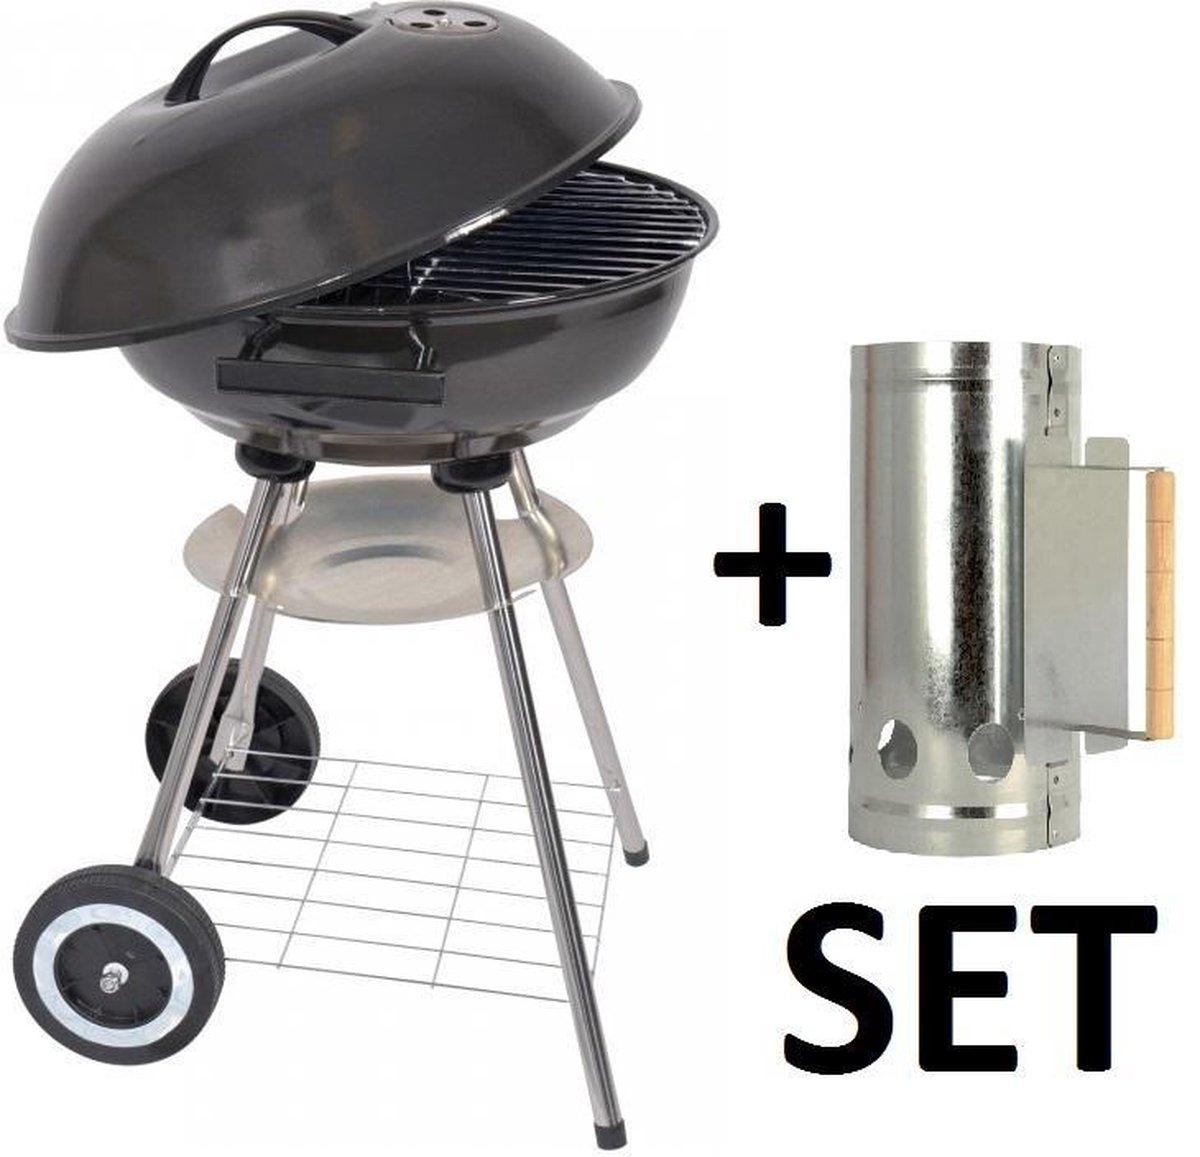 XL Houtskoolbarbecue - Ø 46 cm. + Brikettenstarter